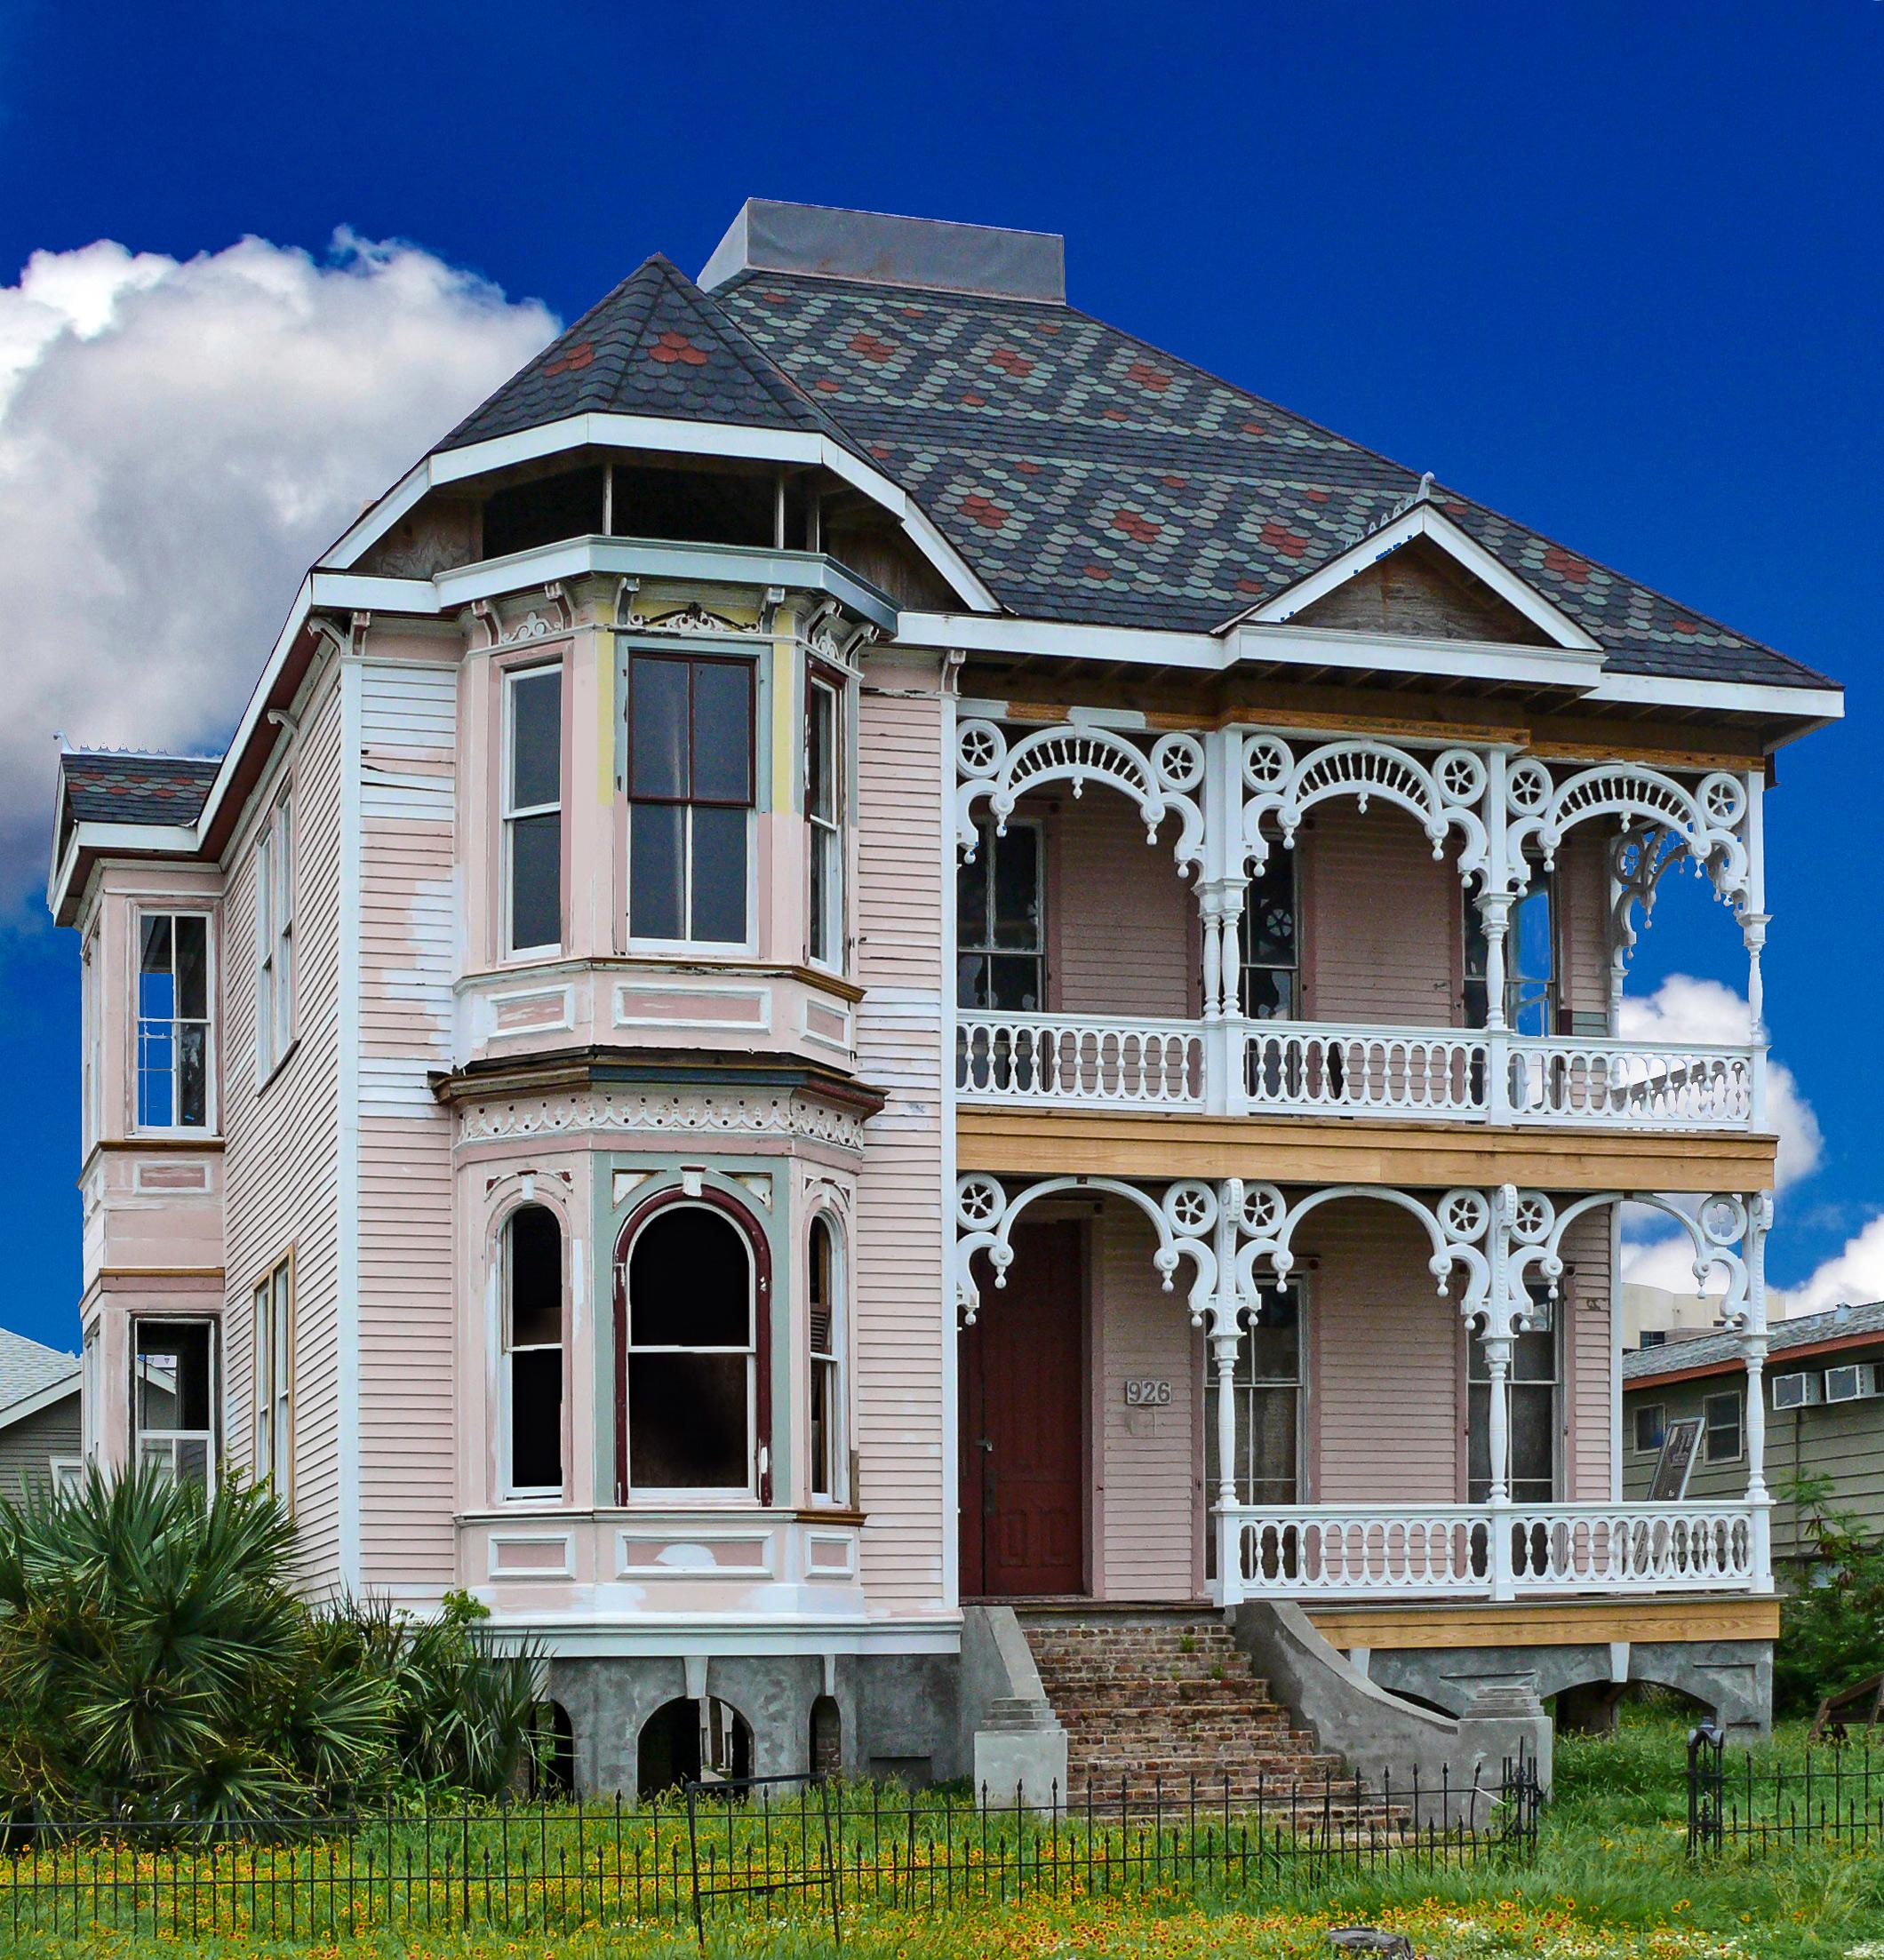 file mckinney mcdonald house galveston jpg wikimedia